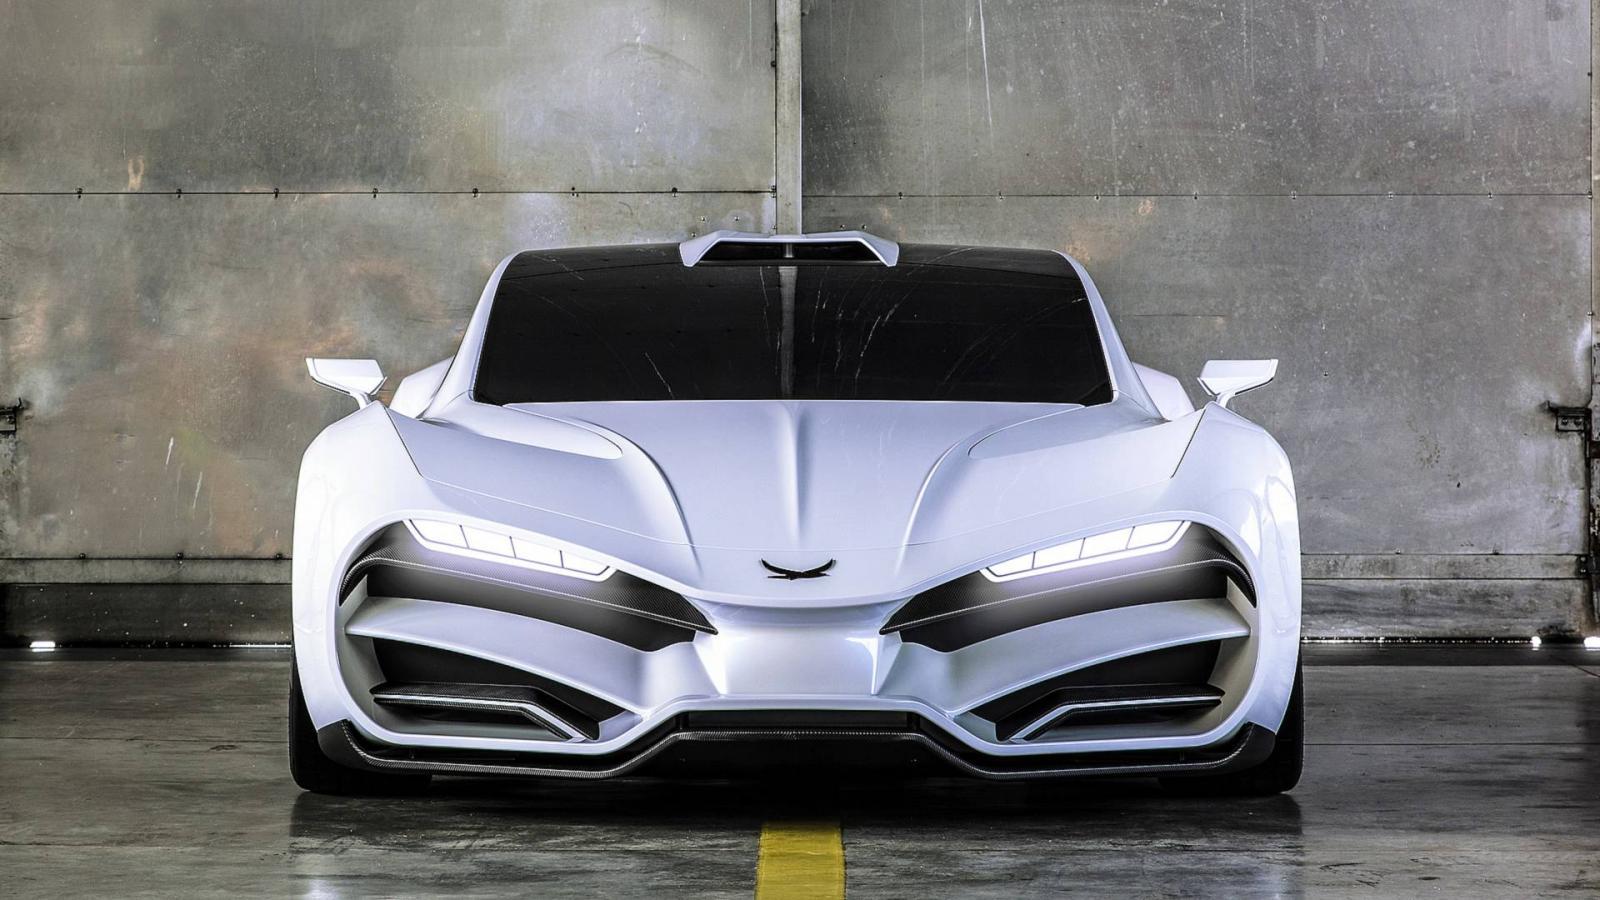 В Австралии создали конкурента Bugatti Chiron